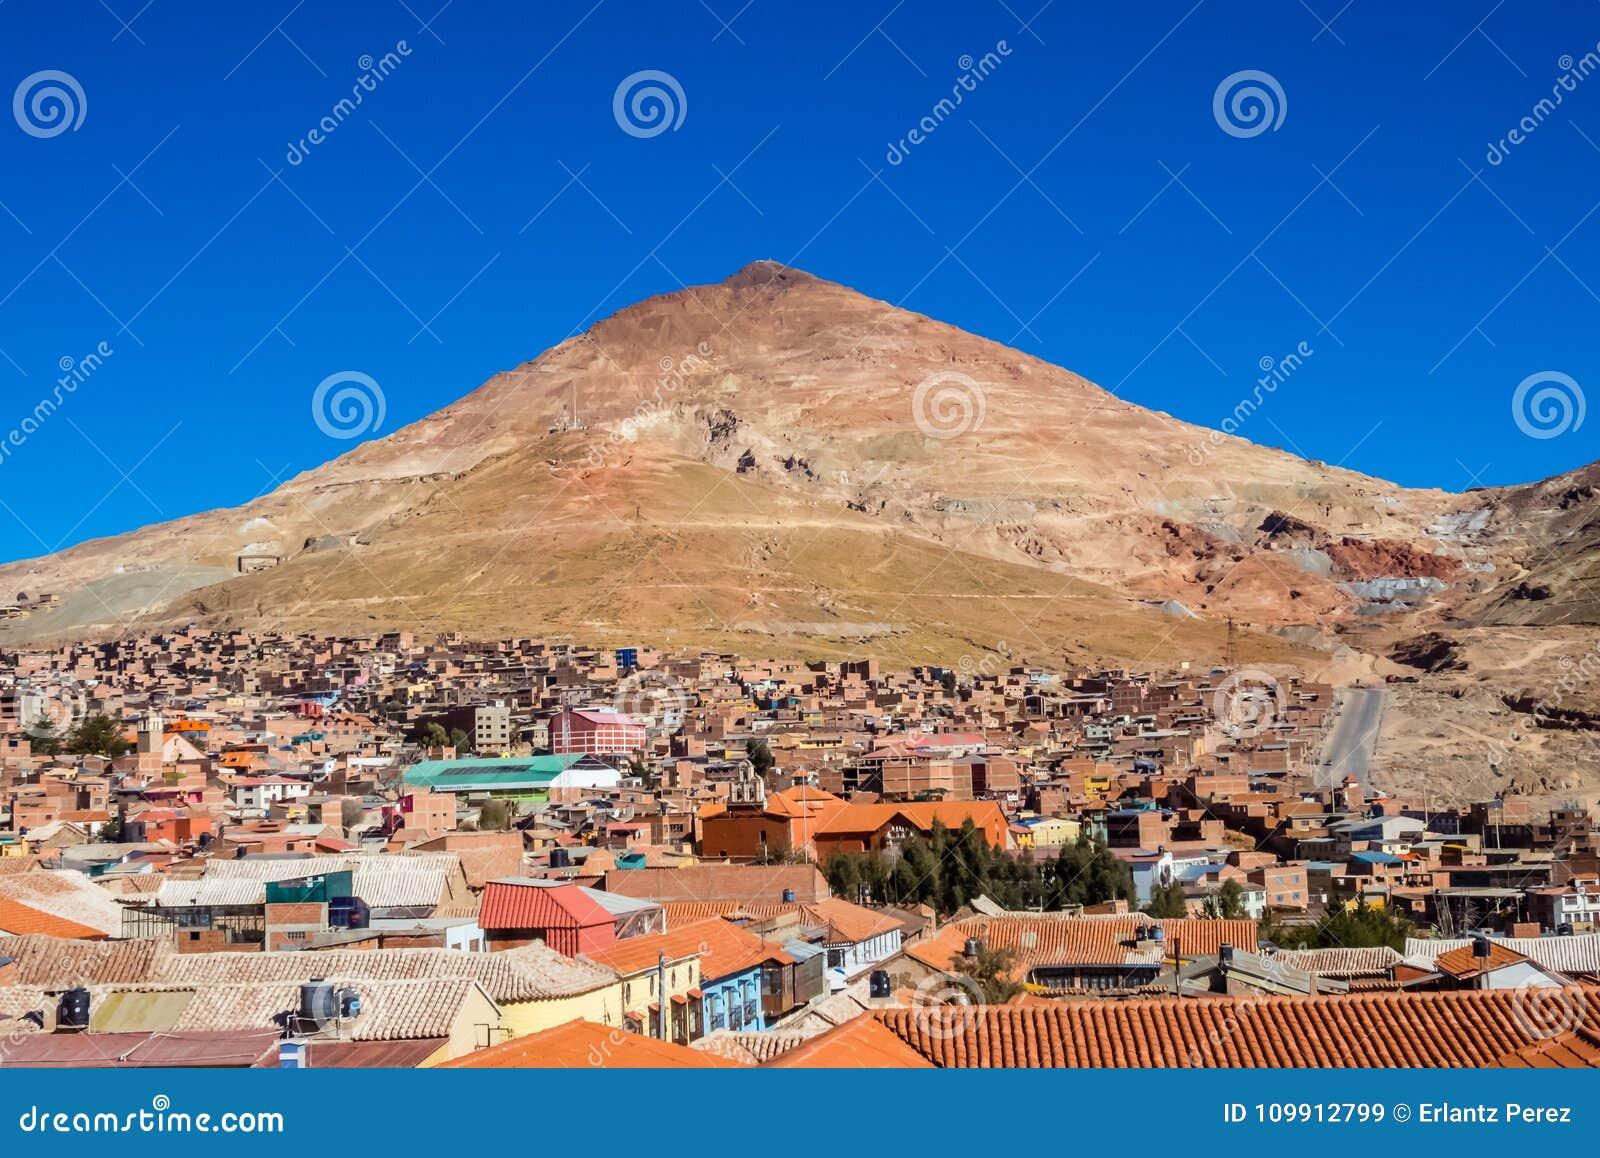 Cerro Rico mountais in Potosi, Bolivië